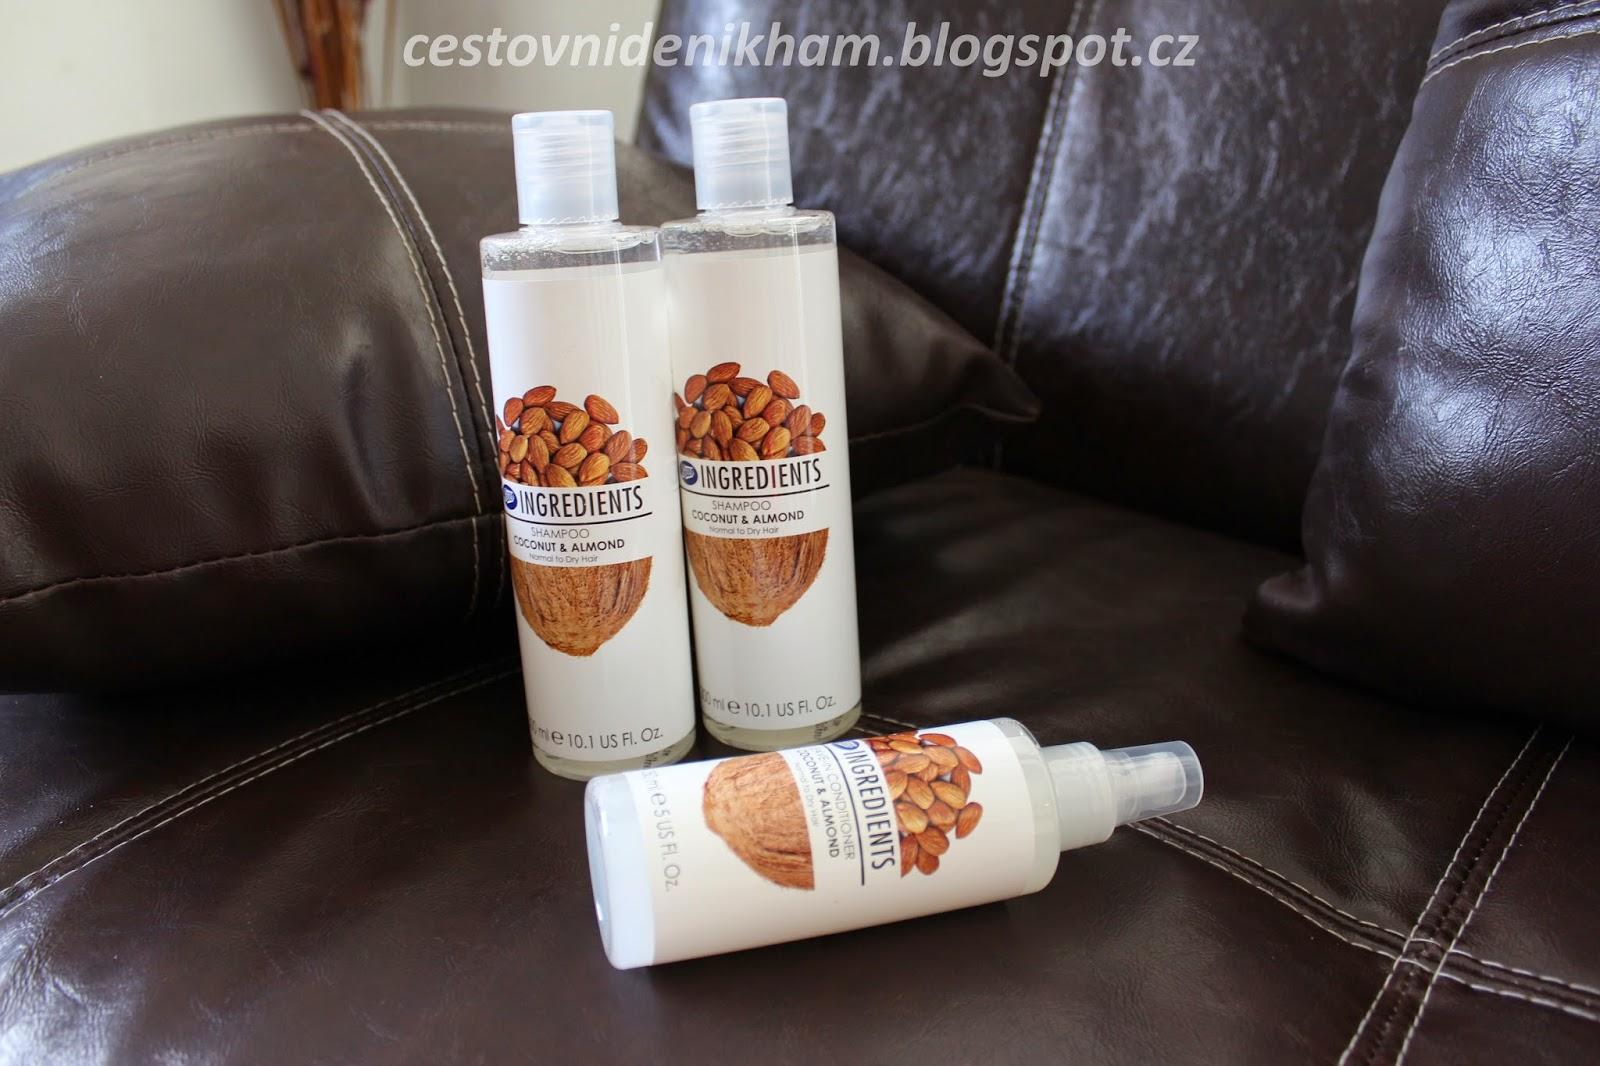 kosmetika z Boots // cosmetics from Boots